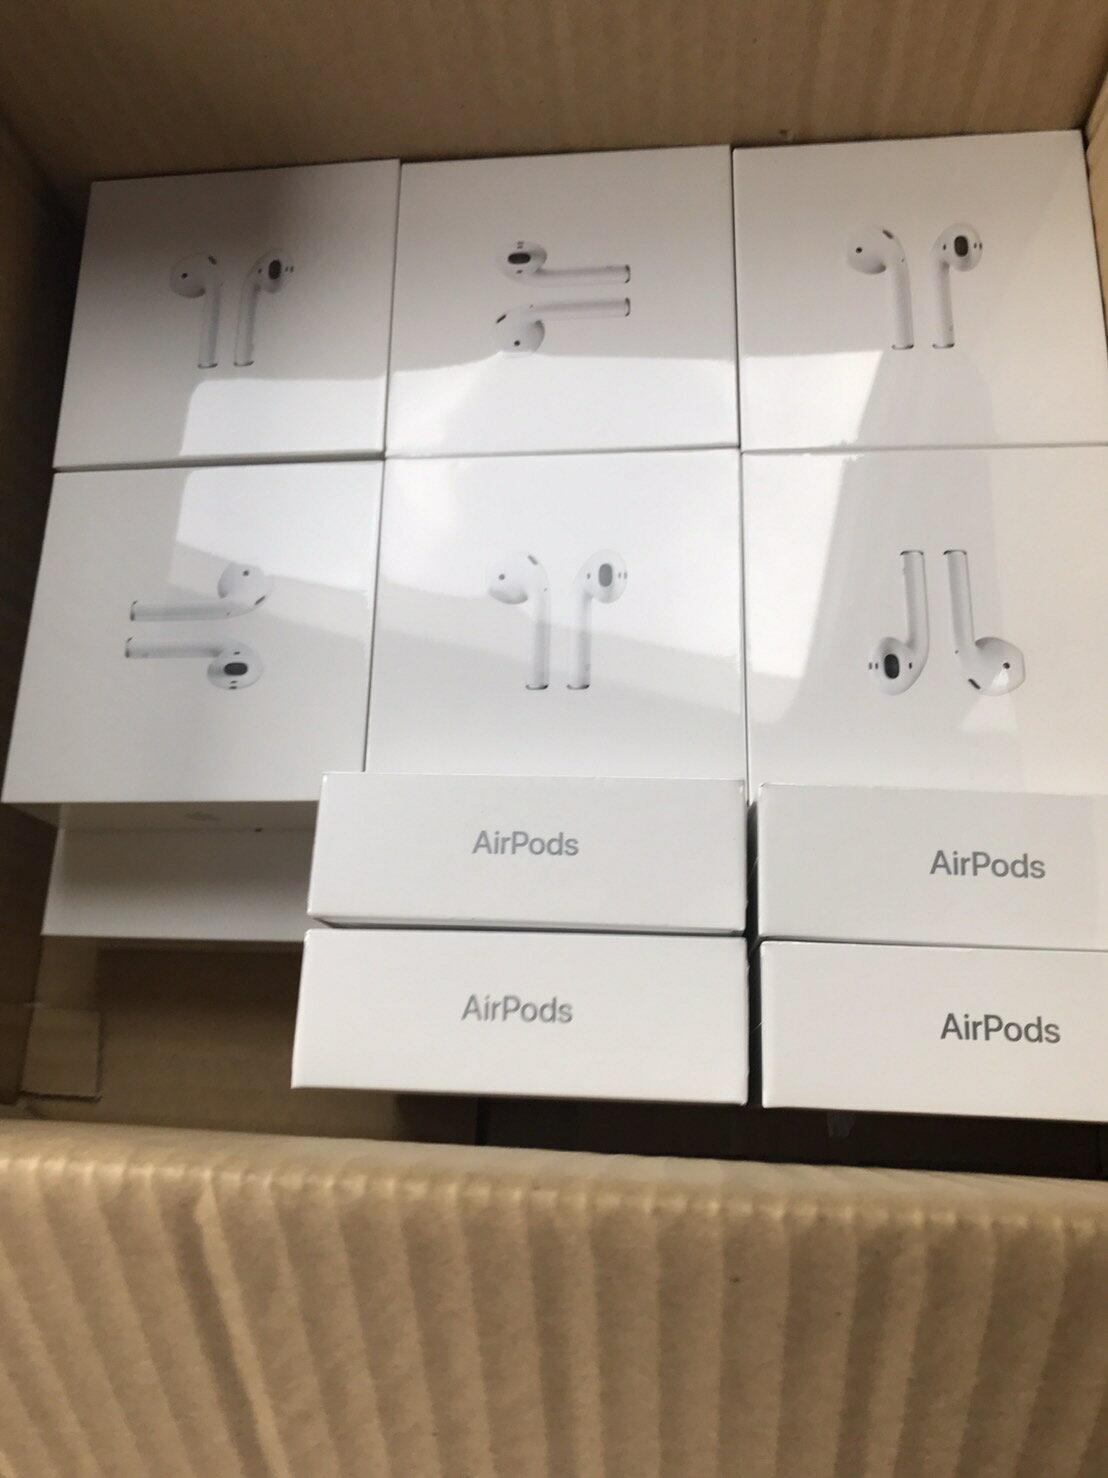 Apple AirPods((2))-(有線充電盒版)-(無線充電盒版)-台灣公司貨蘋果藍牙耳機(((現貨)))24小時快速到貨-免運費